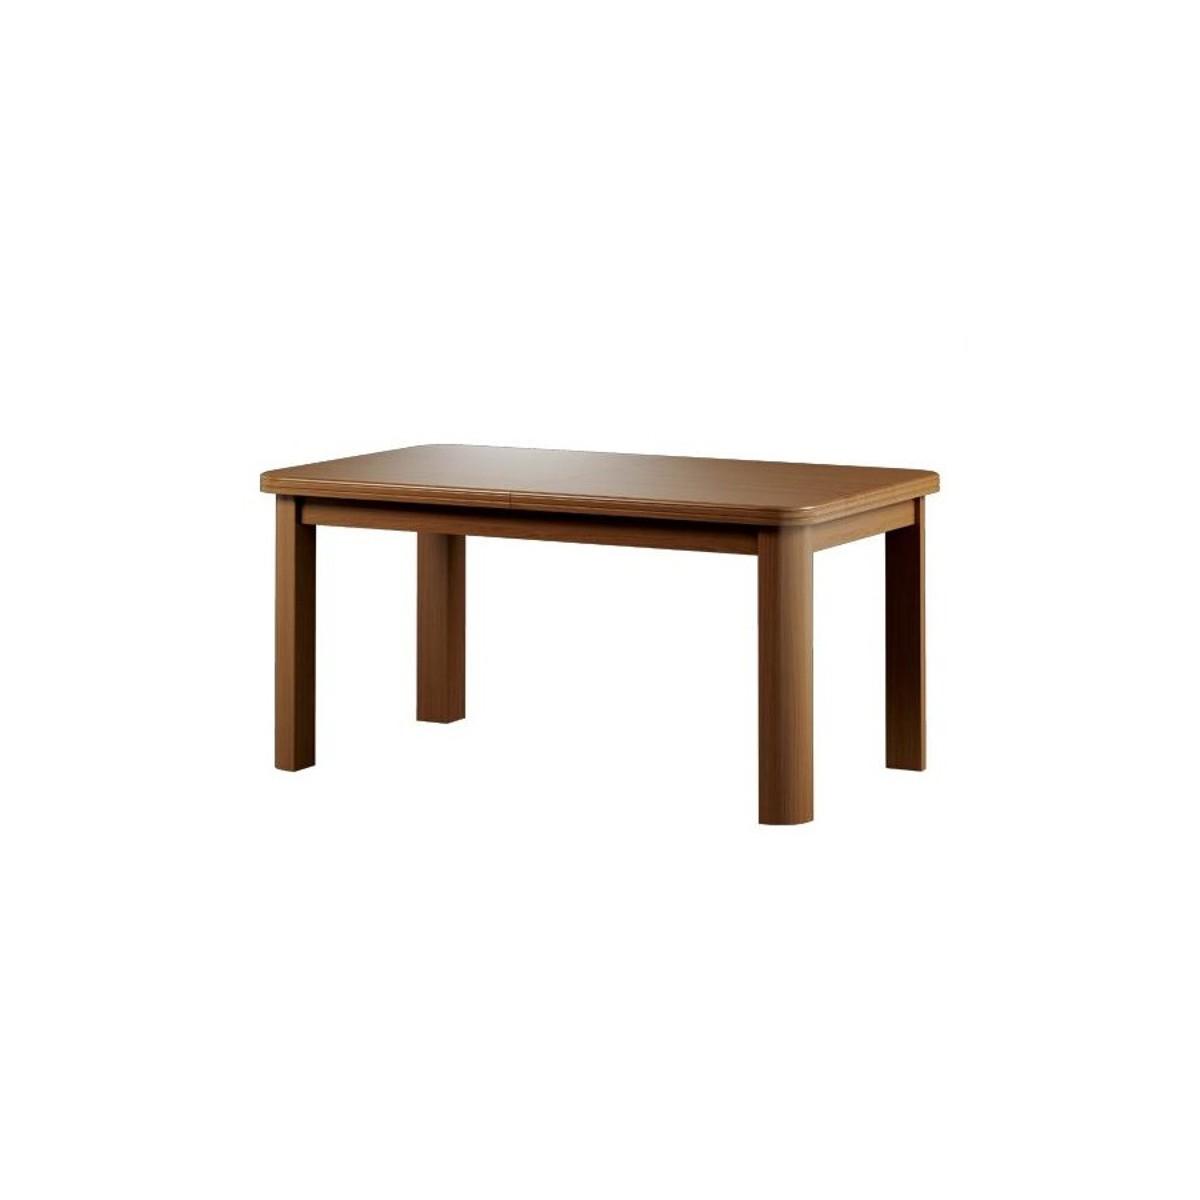 Bawaria stół S22 III Mebdom